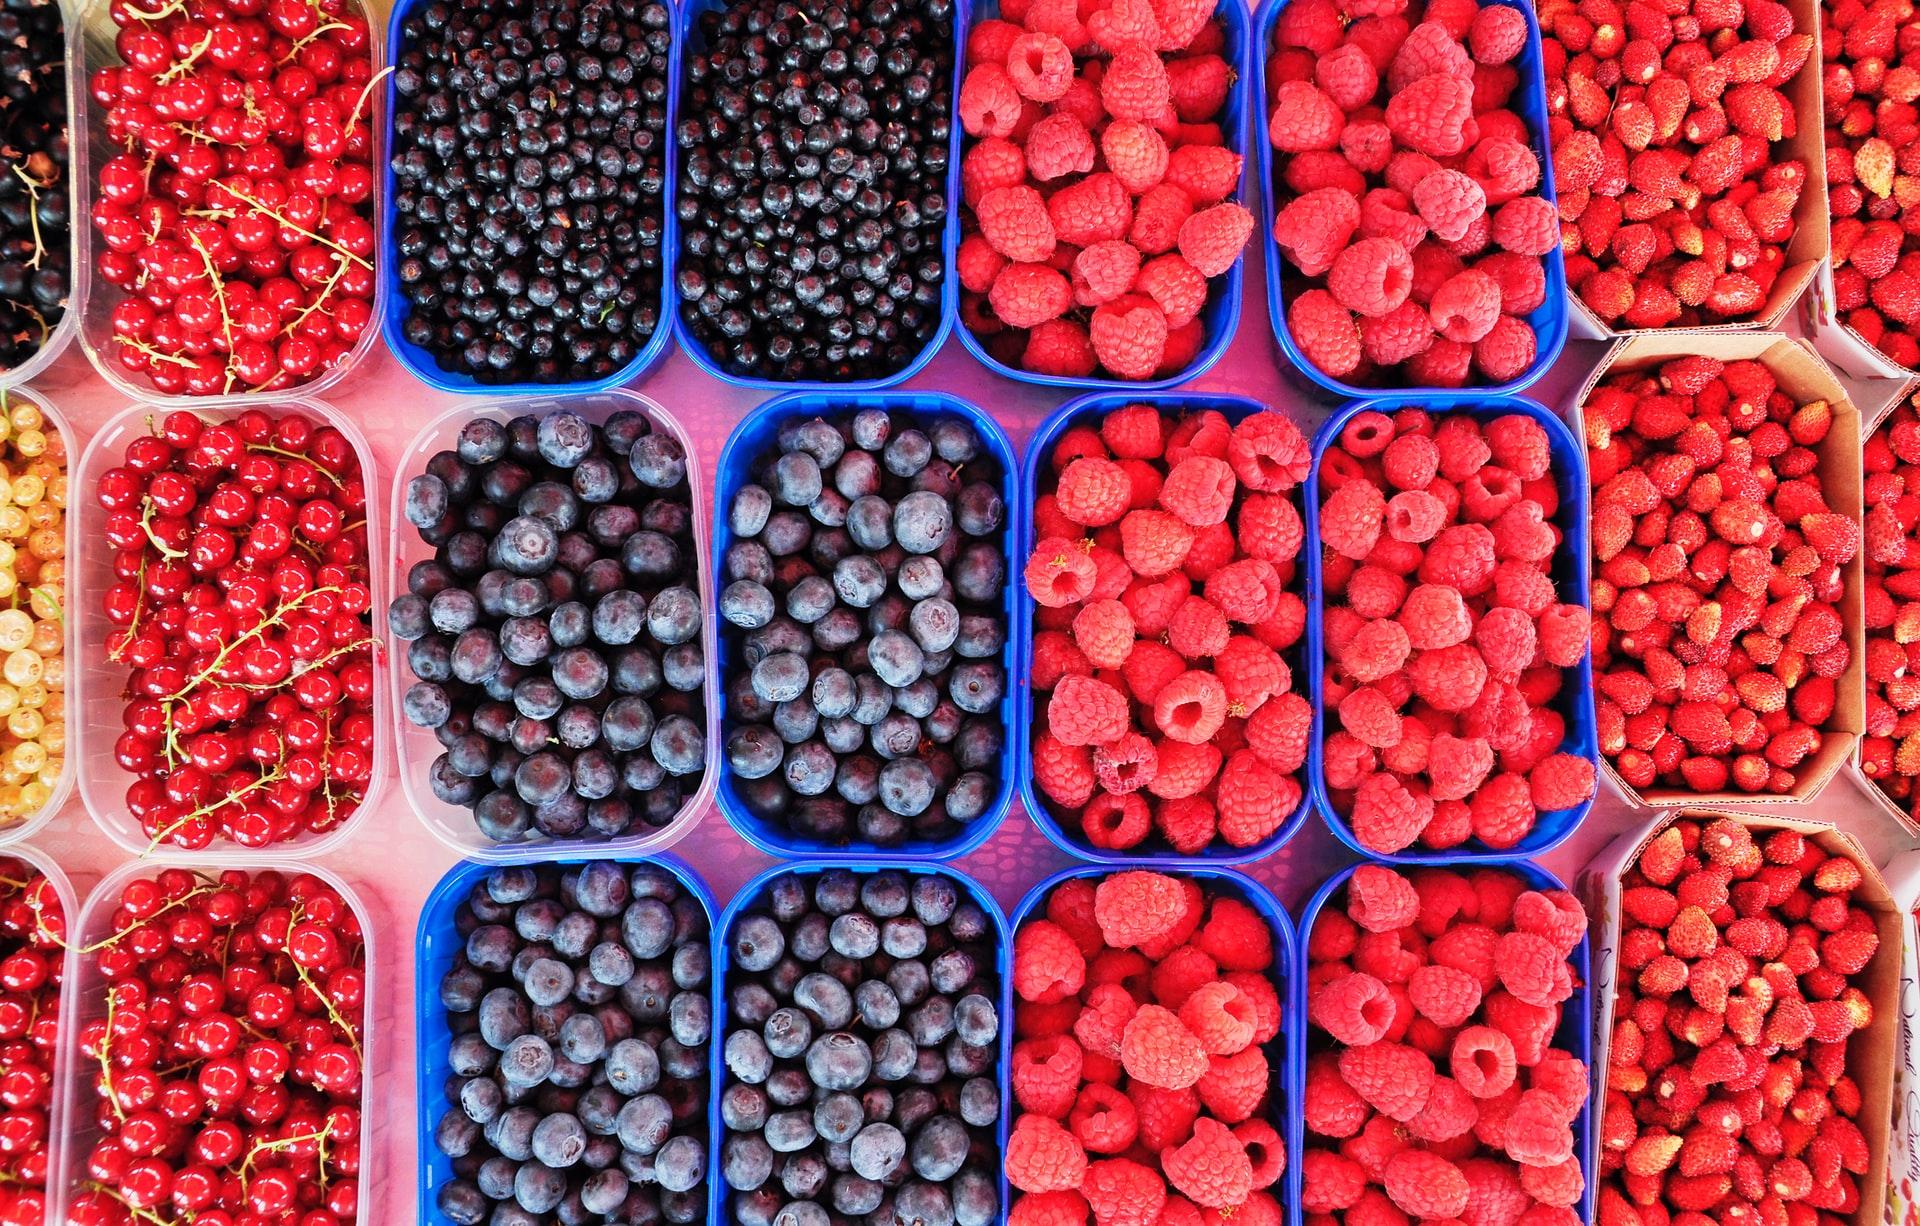 Shop Seasonal Produce and More at Richardson Farms